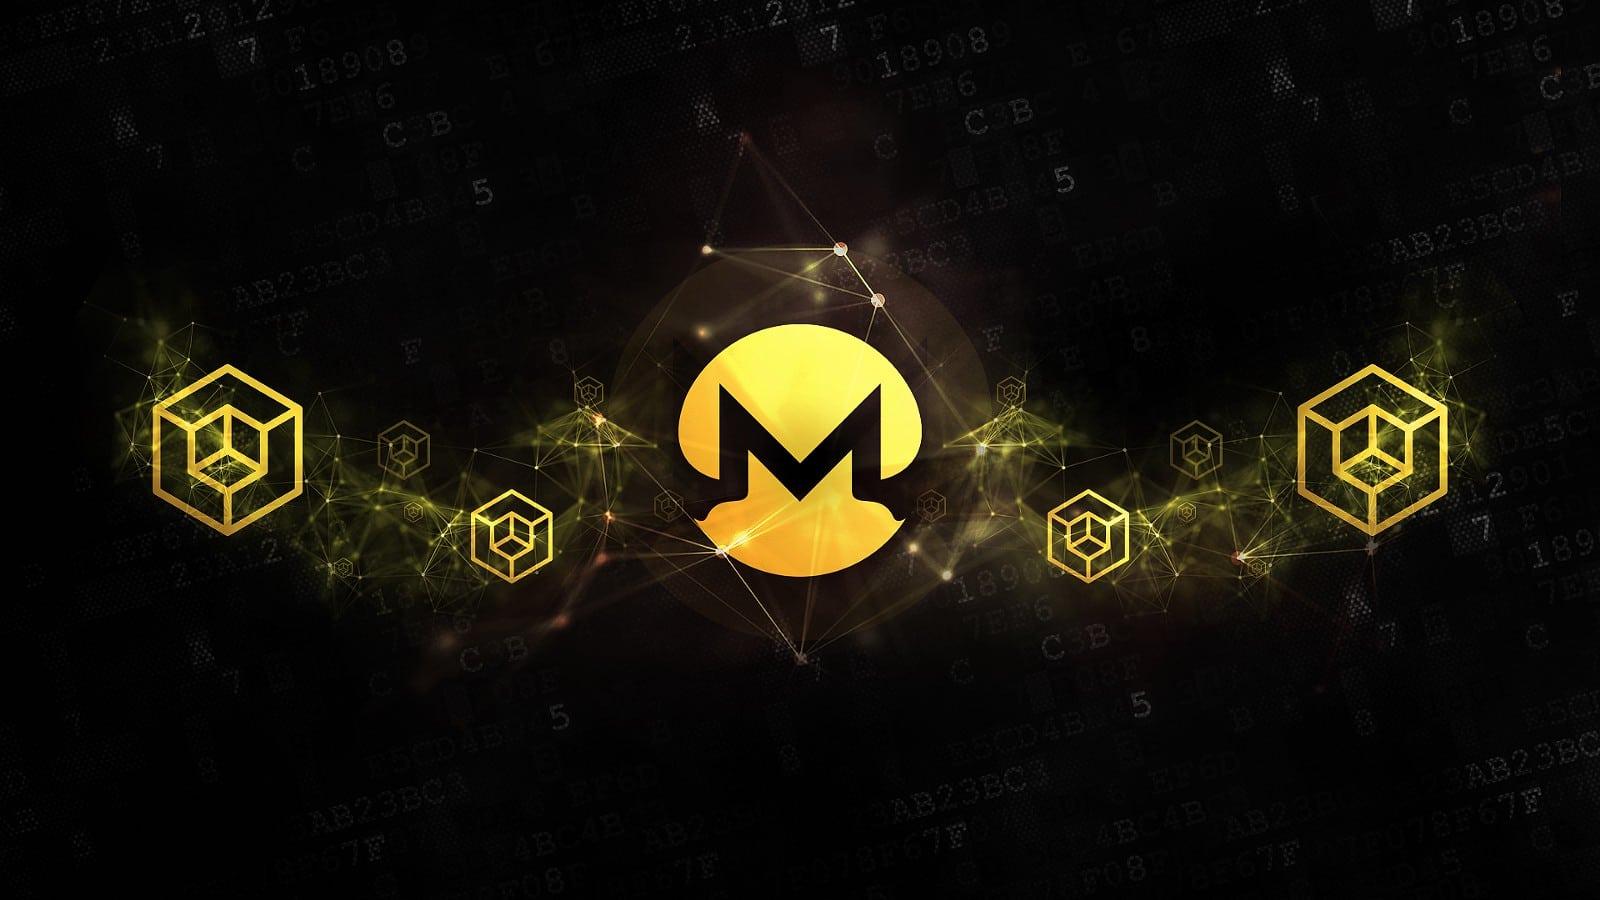 1 EDby2j9y7jKTsGJzvjK1fg - Latest Crypto Developments & News: Bitcoin, Ethereum, Stellar, Monero, And PIVX